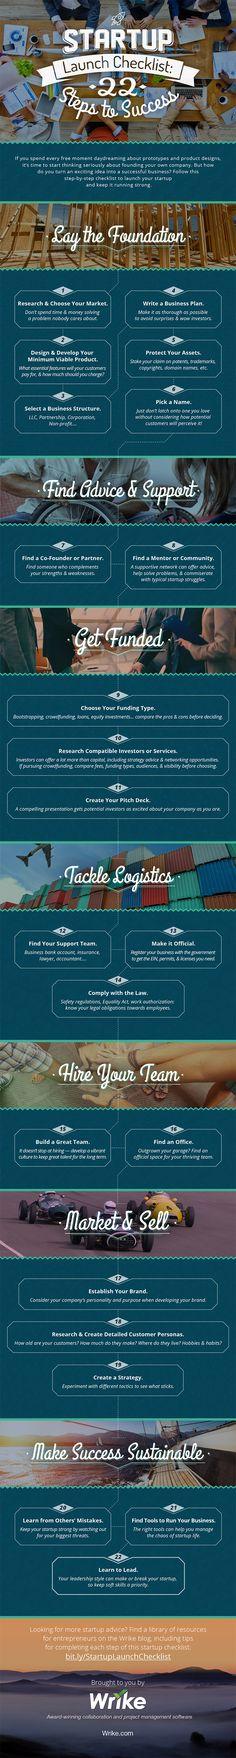 Product Launch Checklist {Infographic} - Best Infographics | Bizz ...